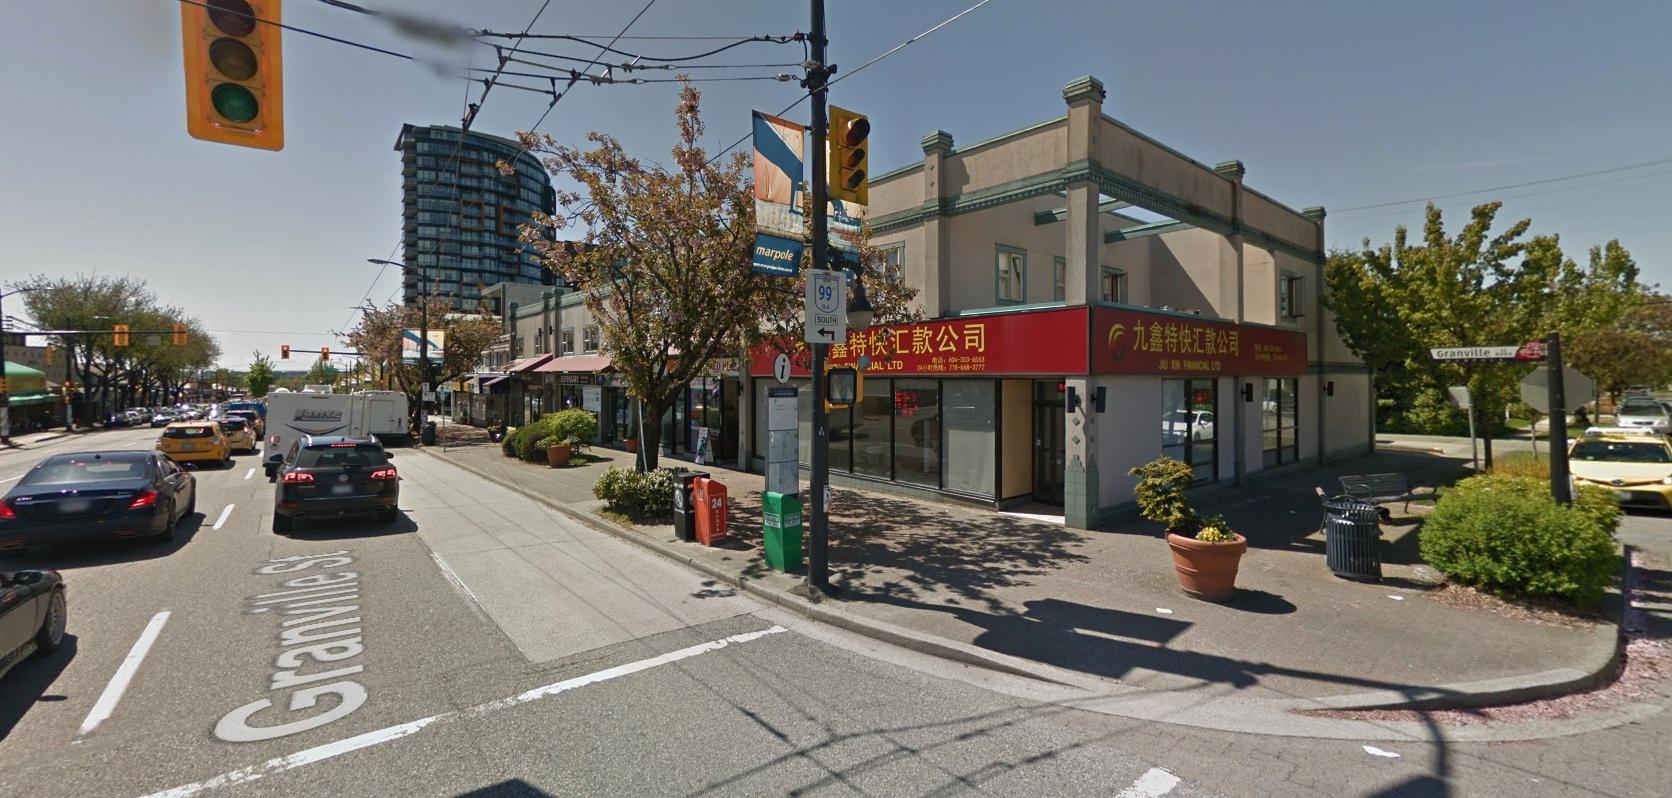 1506 West 68th Avenue 8405-8465 Granville Street Vancouver